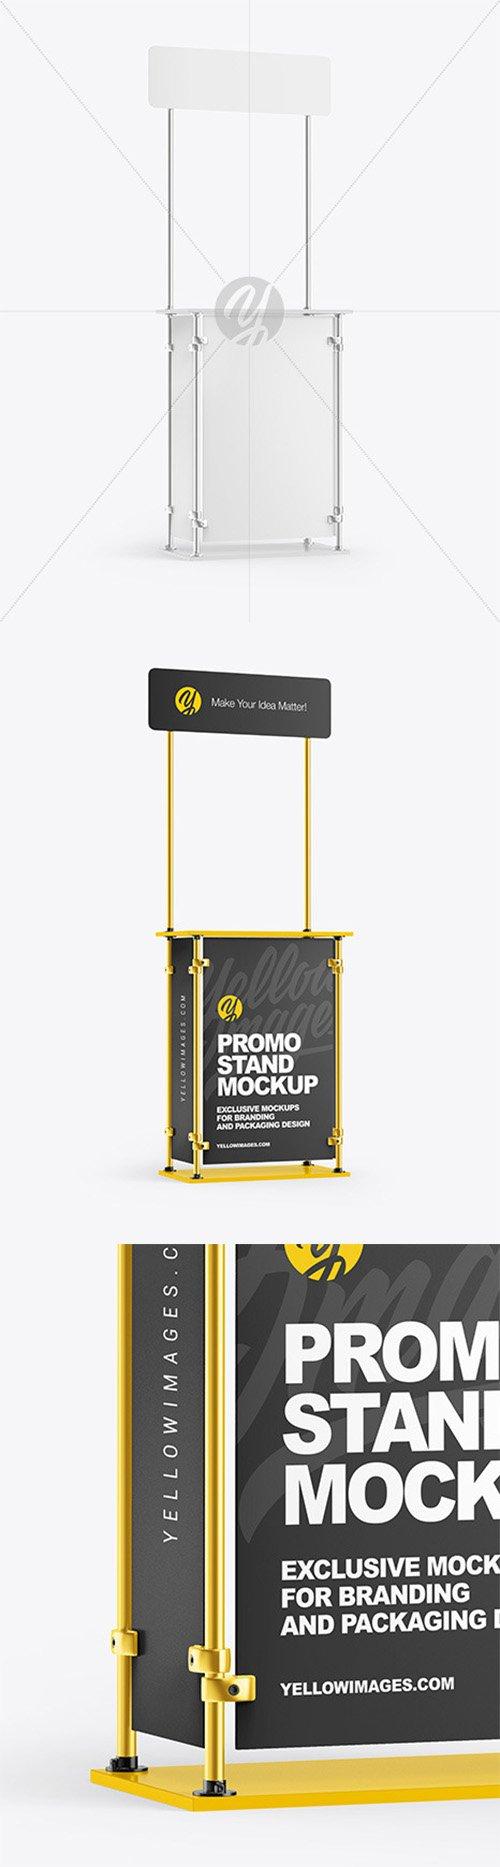 Metallic Promo Stand Mockup 63616 TIF